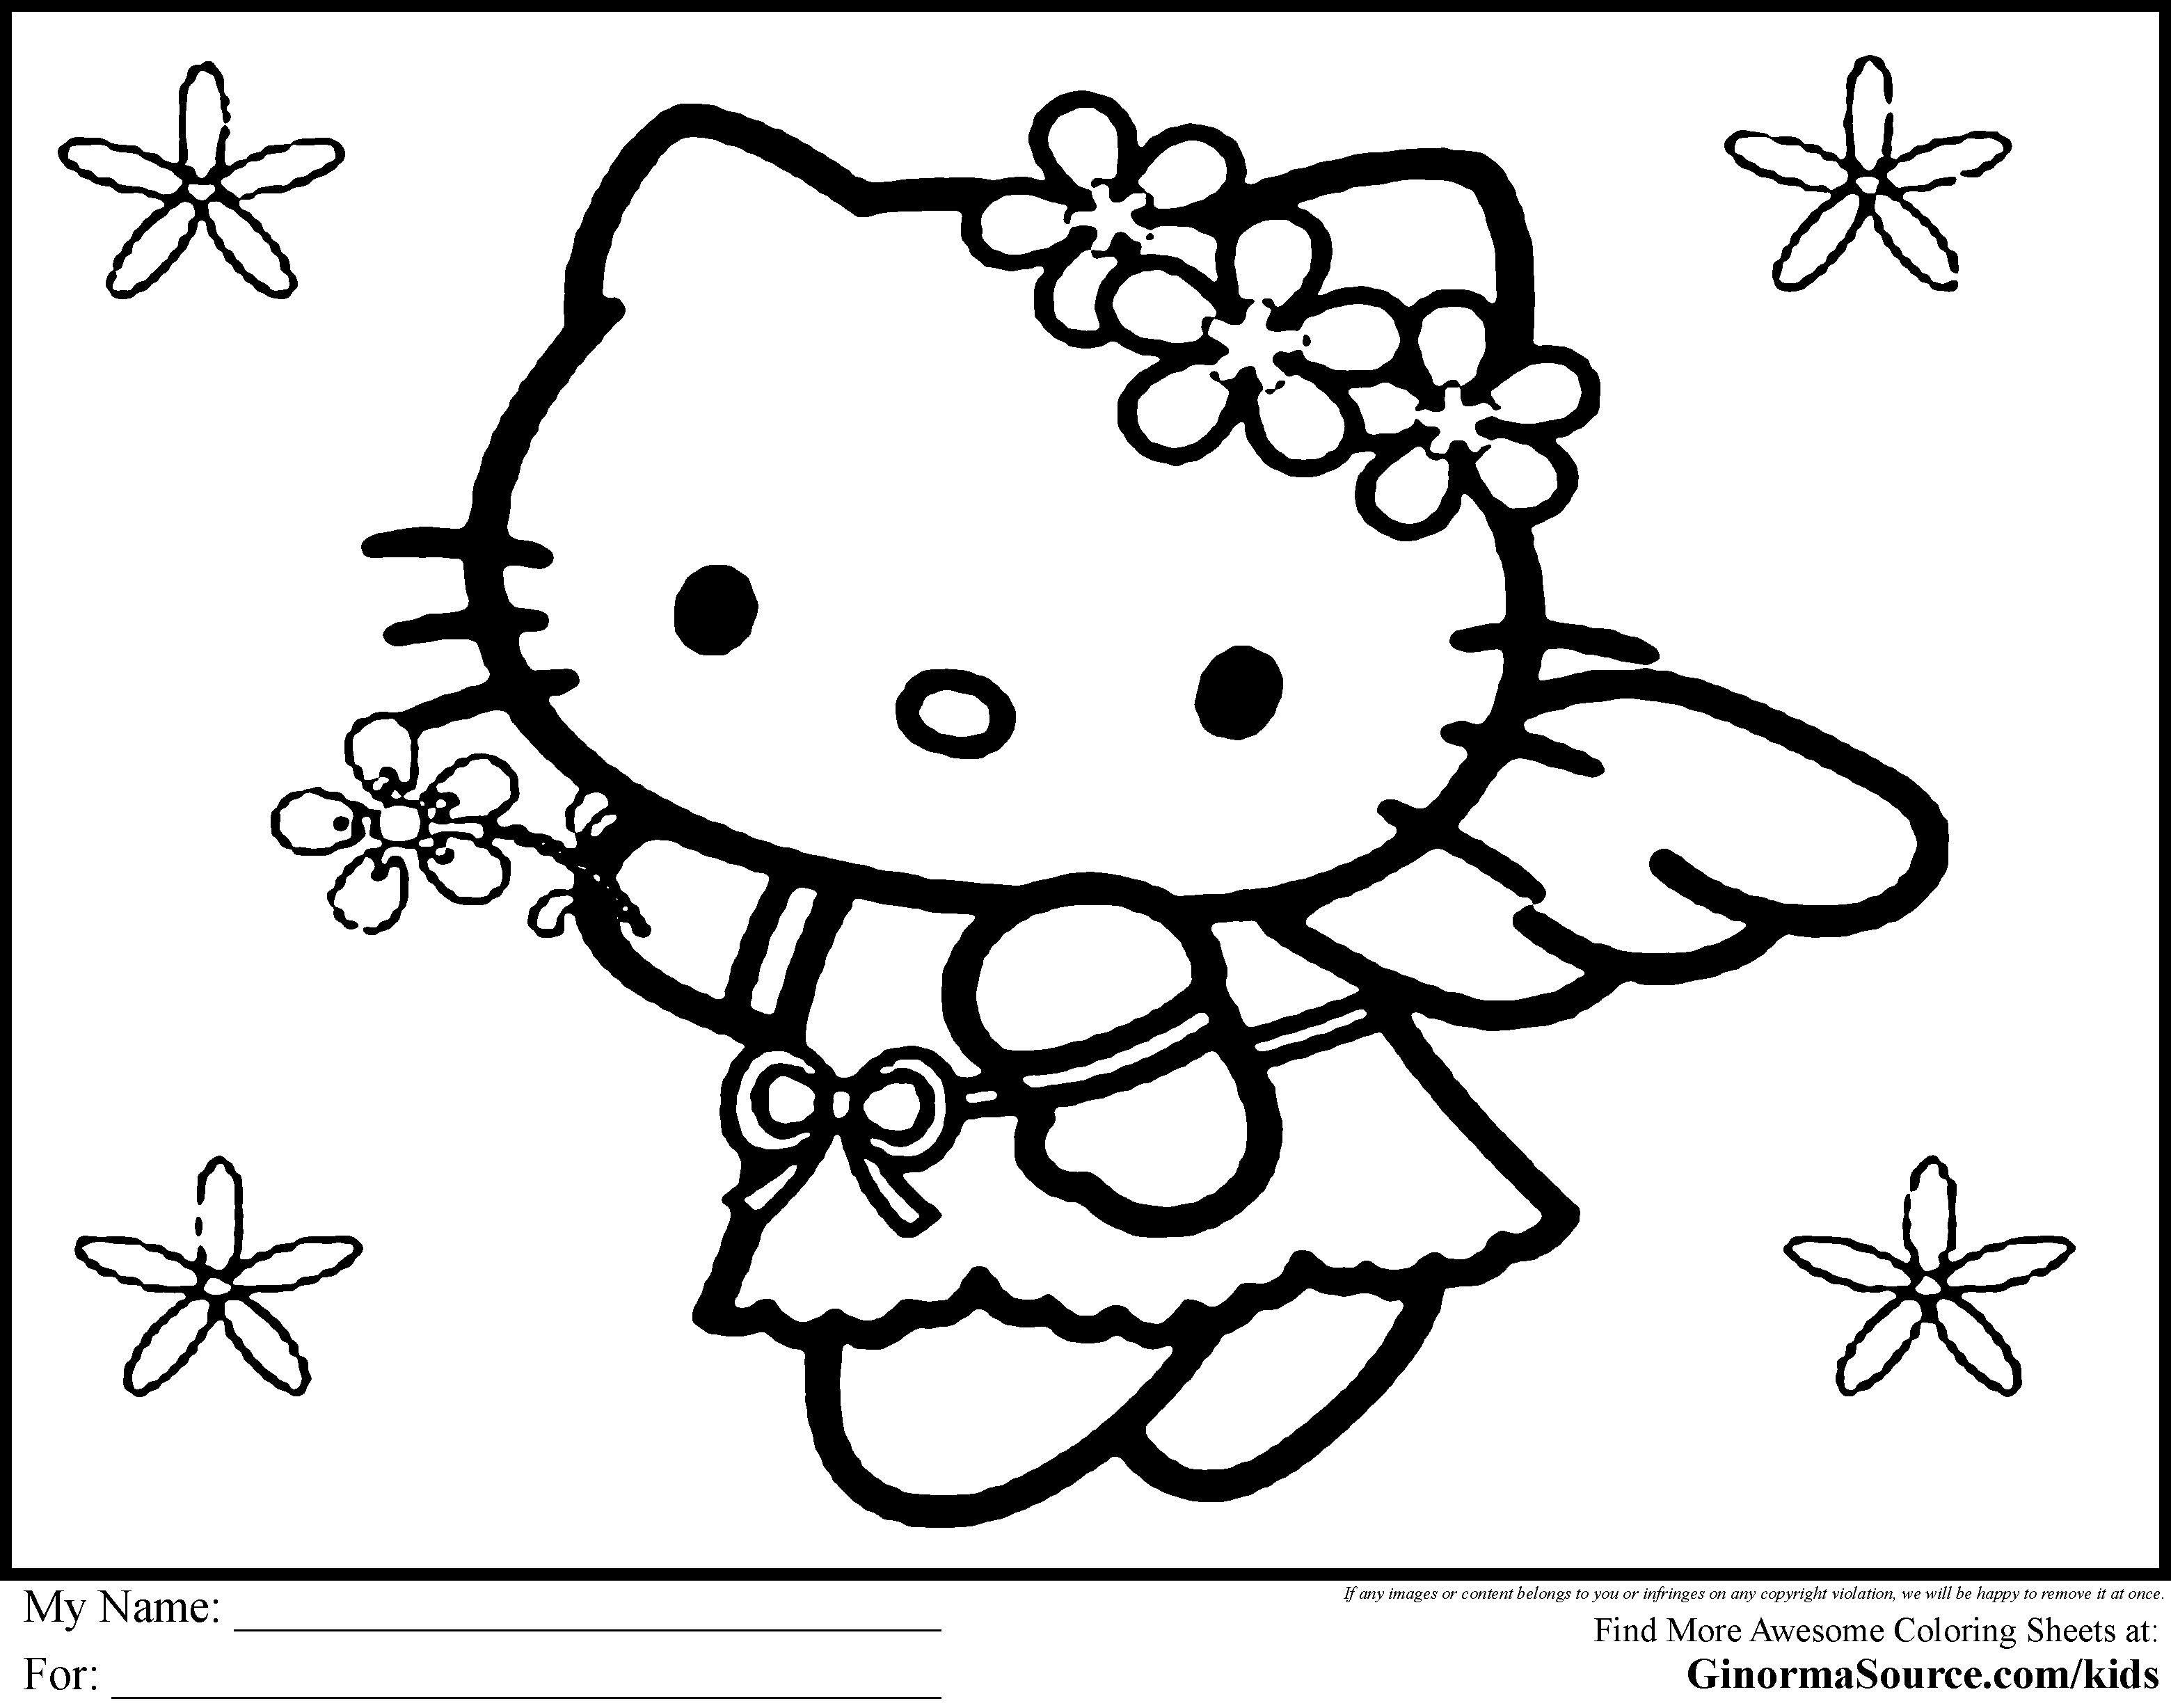 Ausmalbilder Hello Kitty Meerjungfrau - Coloring and Drawing